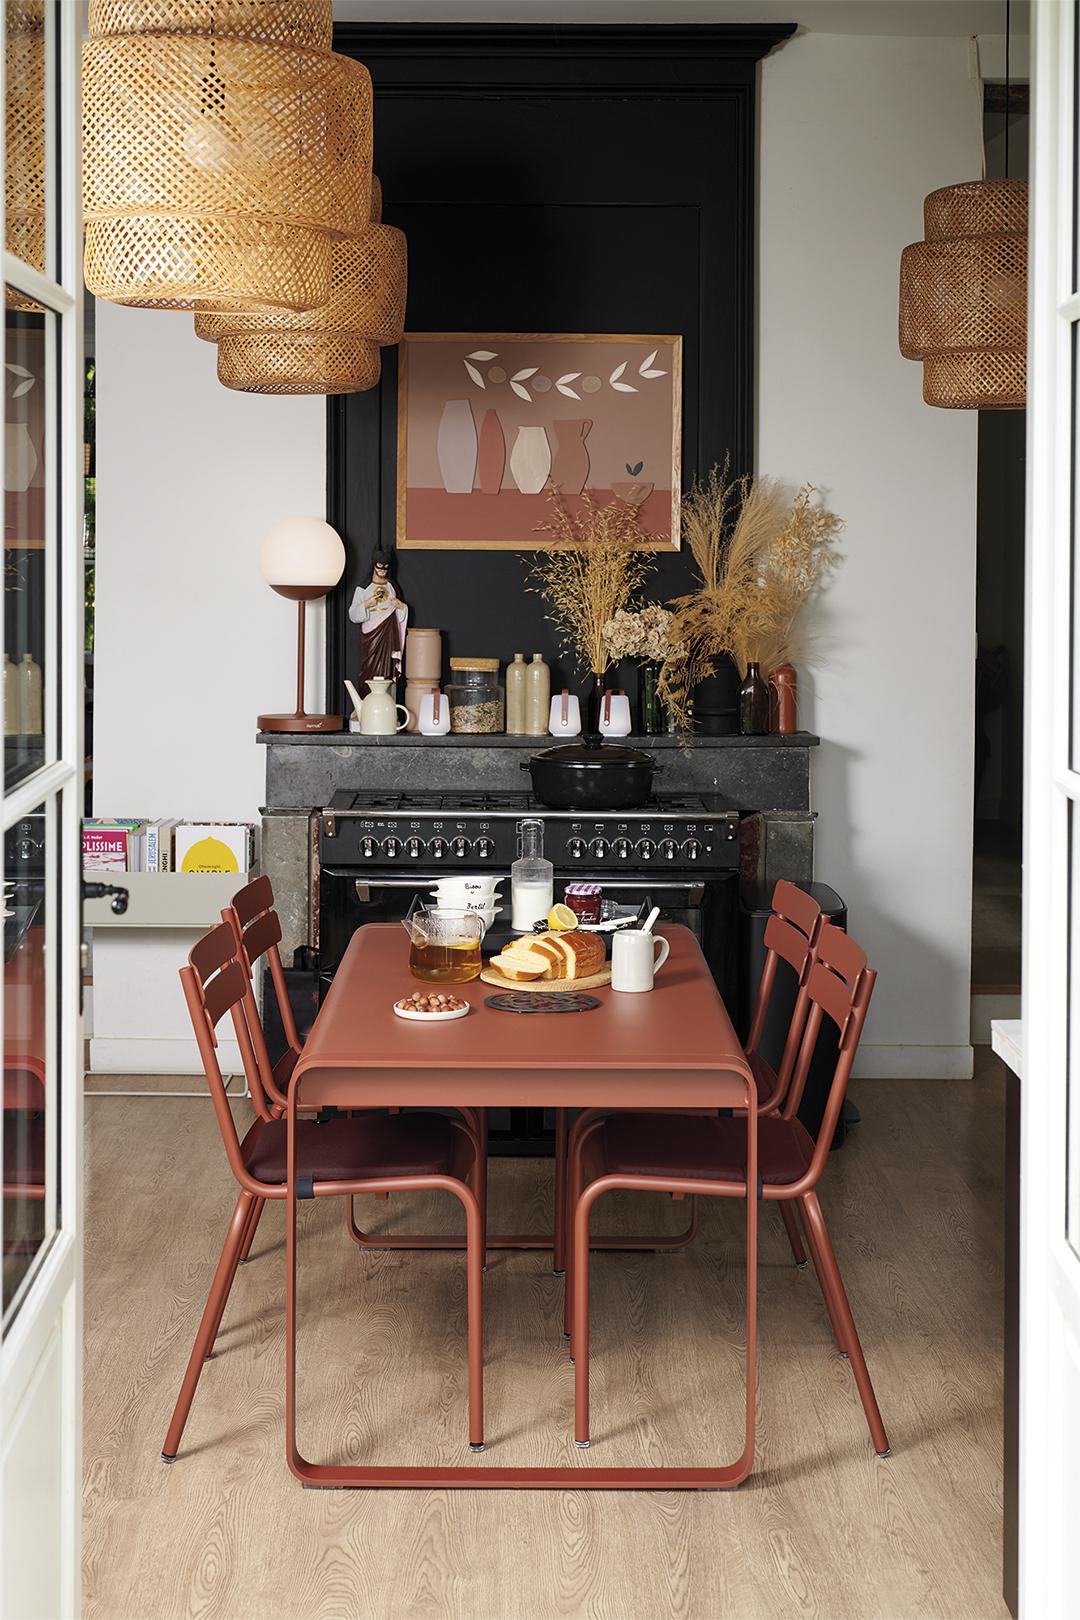 chaise metal, table metal, chaise fermob, table de jardin, mobilier de jardin en metal, metal furniture